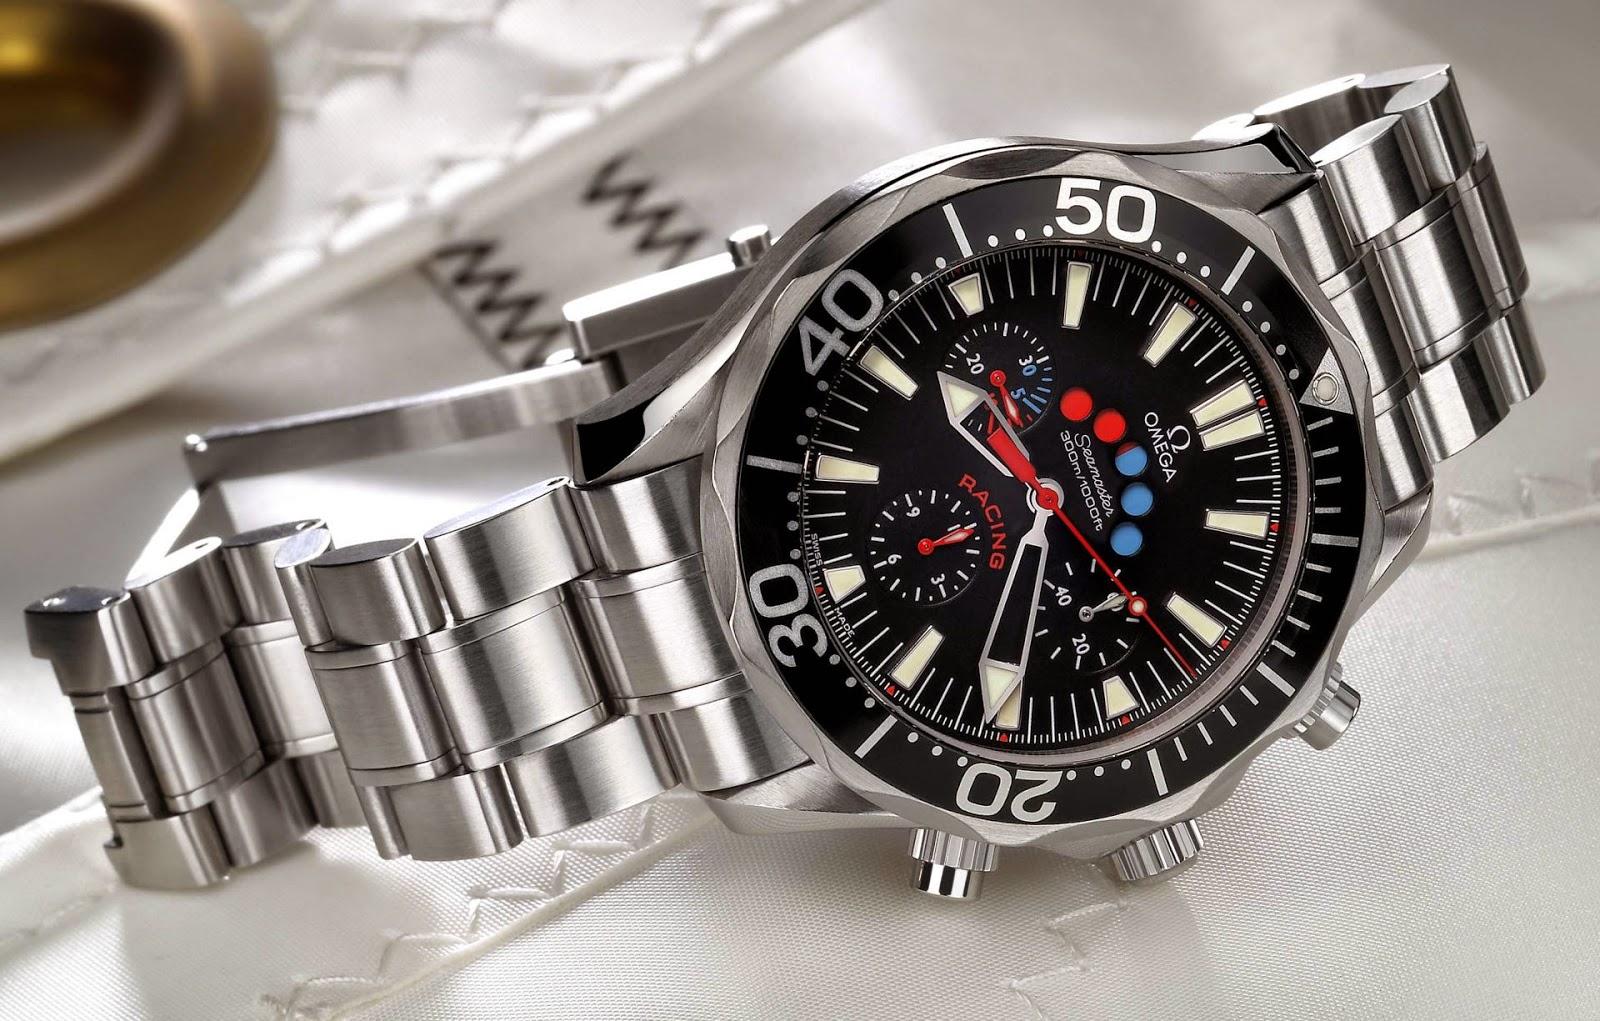 OMEGA Seamaster Chronograph Regatta Countdown Timer